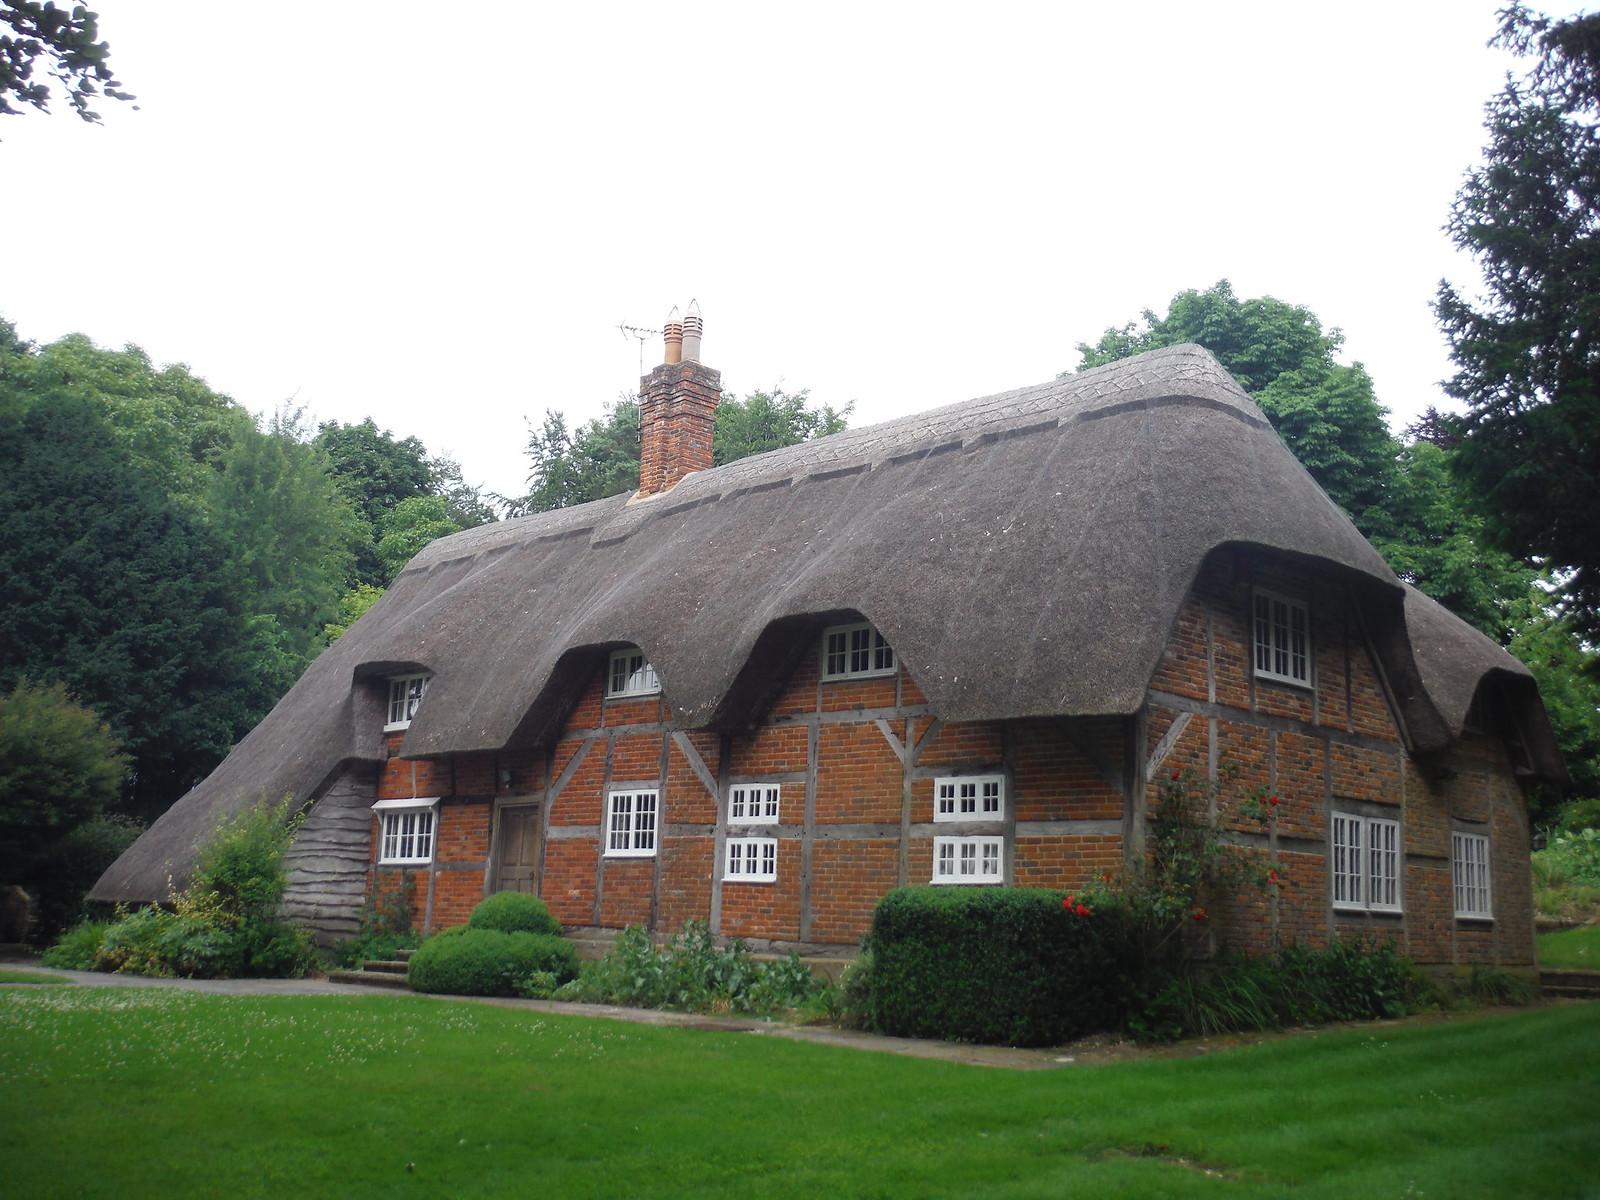 House in Michelmersh SWC Walk 265 - Dean to Mottisfont and Dunbridge